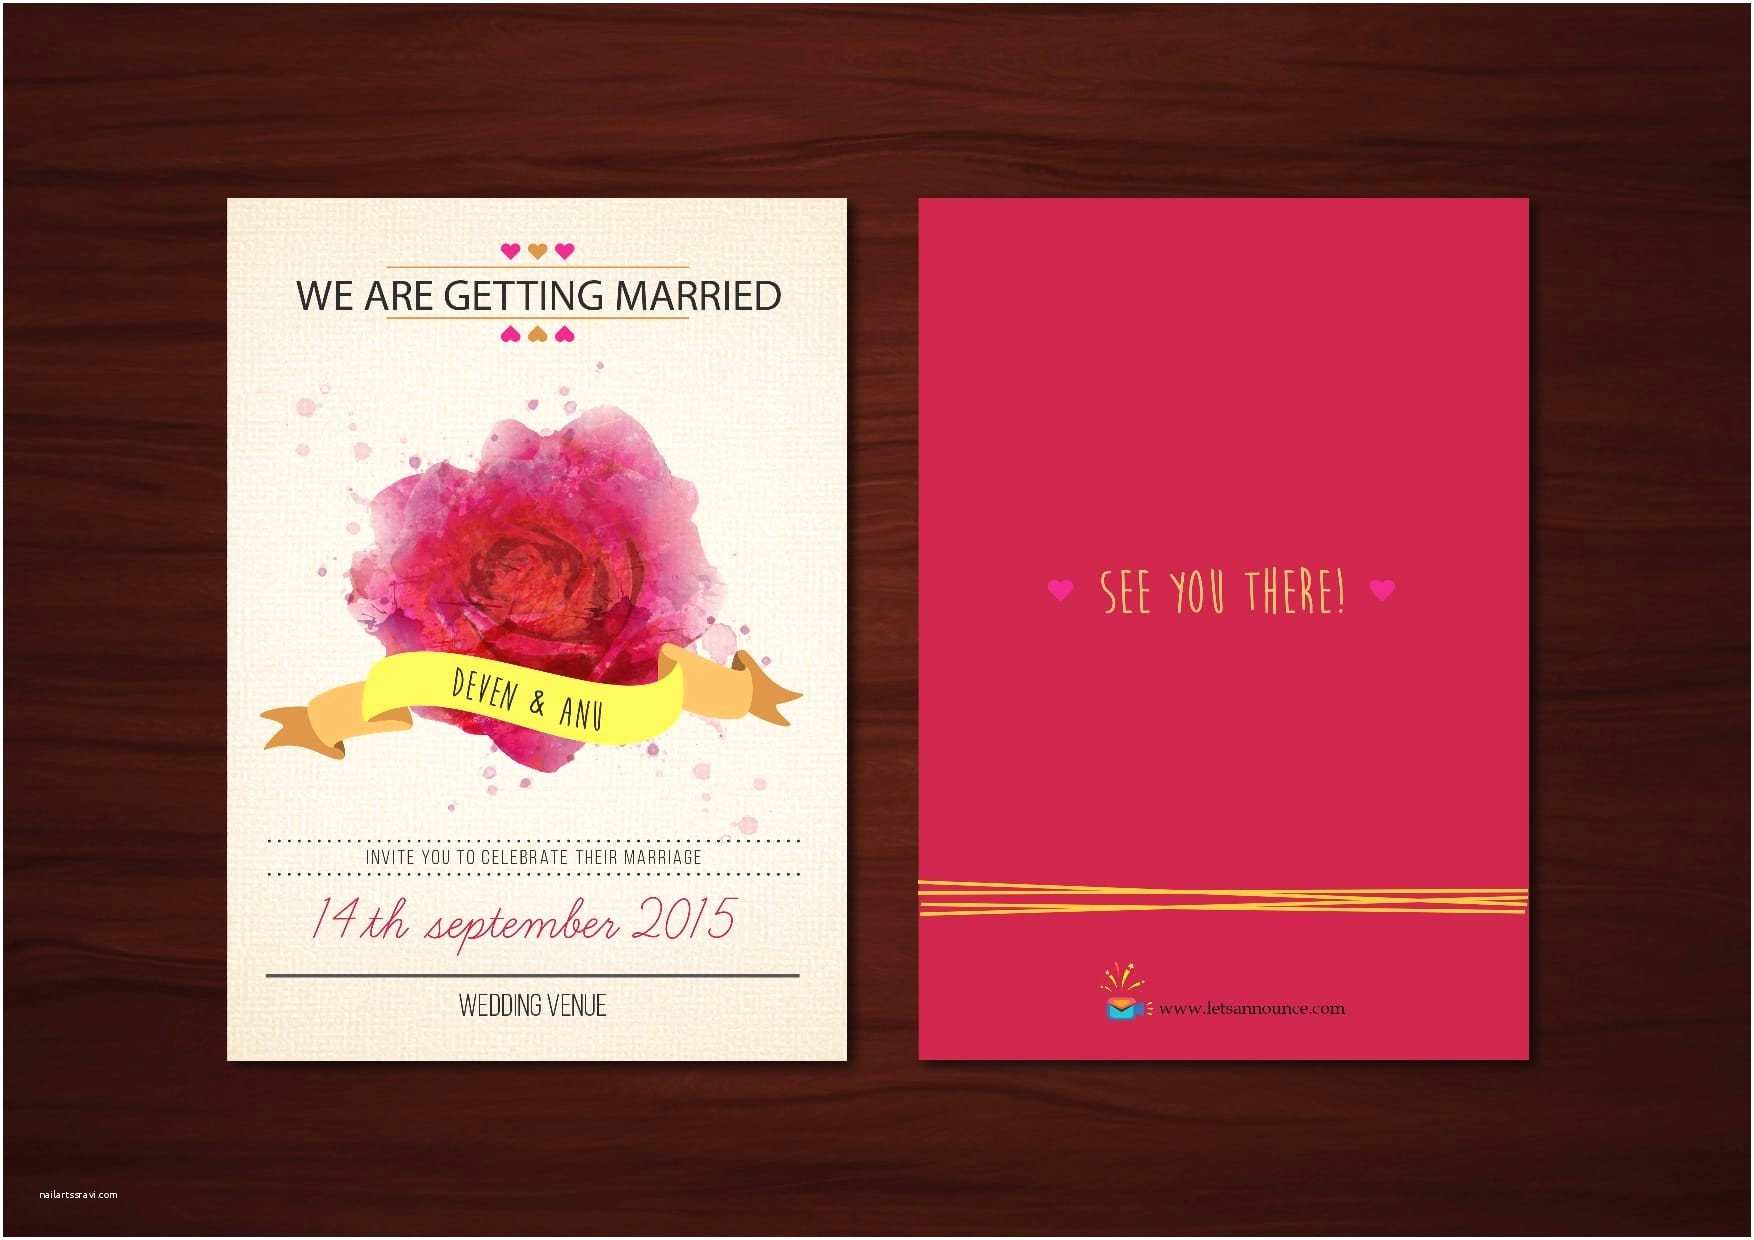 Printing Wedding Invitations at Kinkos Fantastic Print Wedding Invitations at Kinkos Pattern